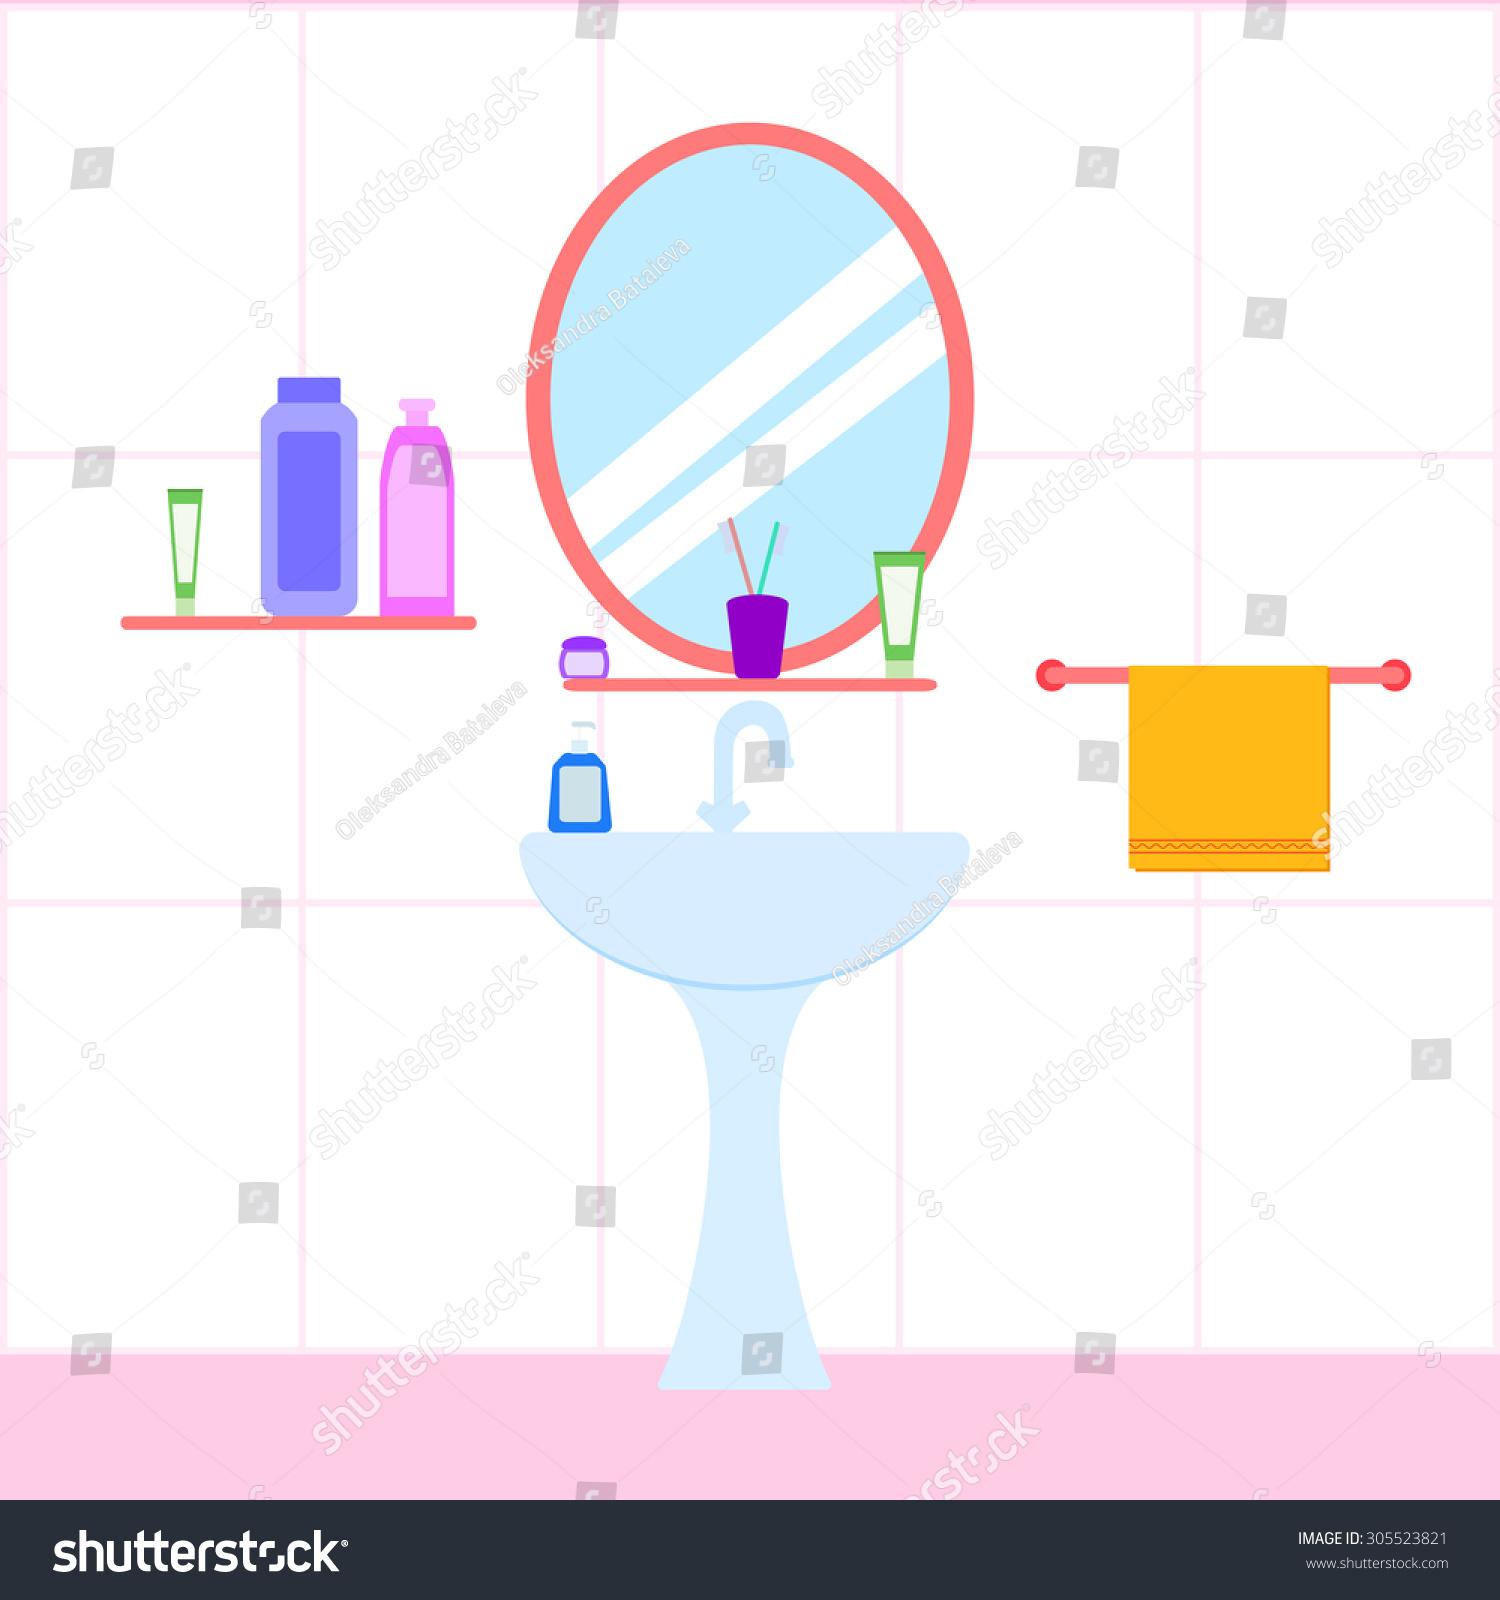 Flat Bathroom Sink Mirror Bottle Soap Stock Vector 305523821 ... for Bathroom Sink Toothbrush Clipart  103wja